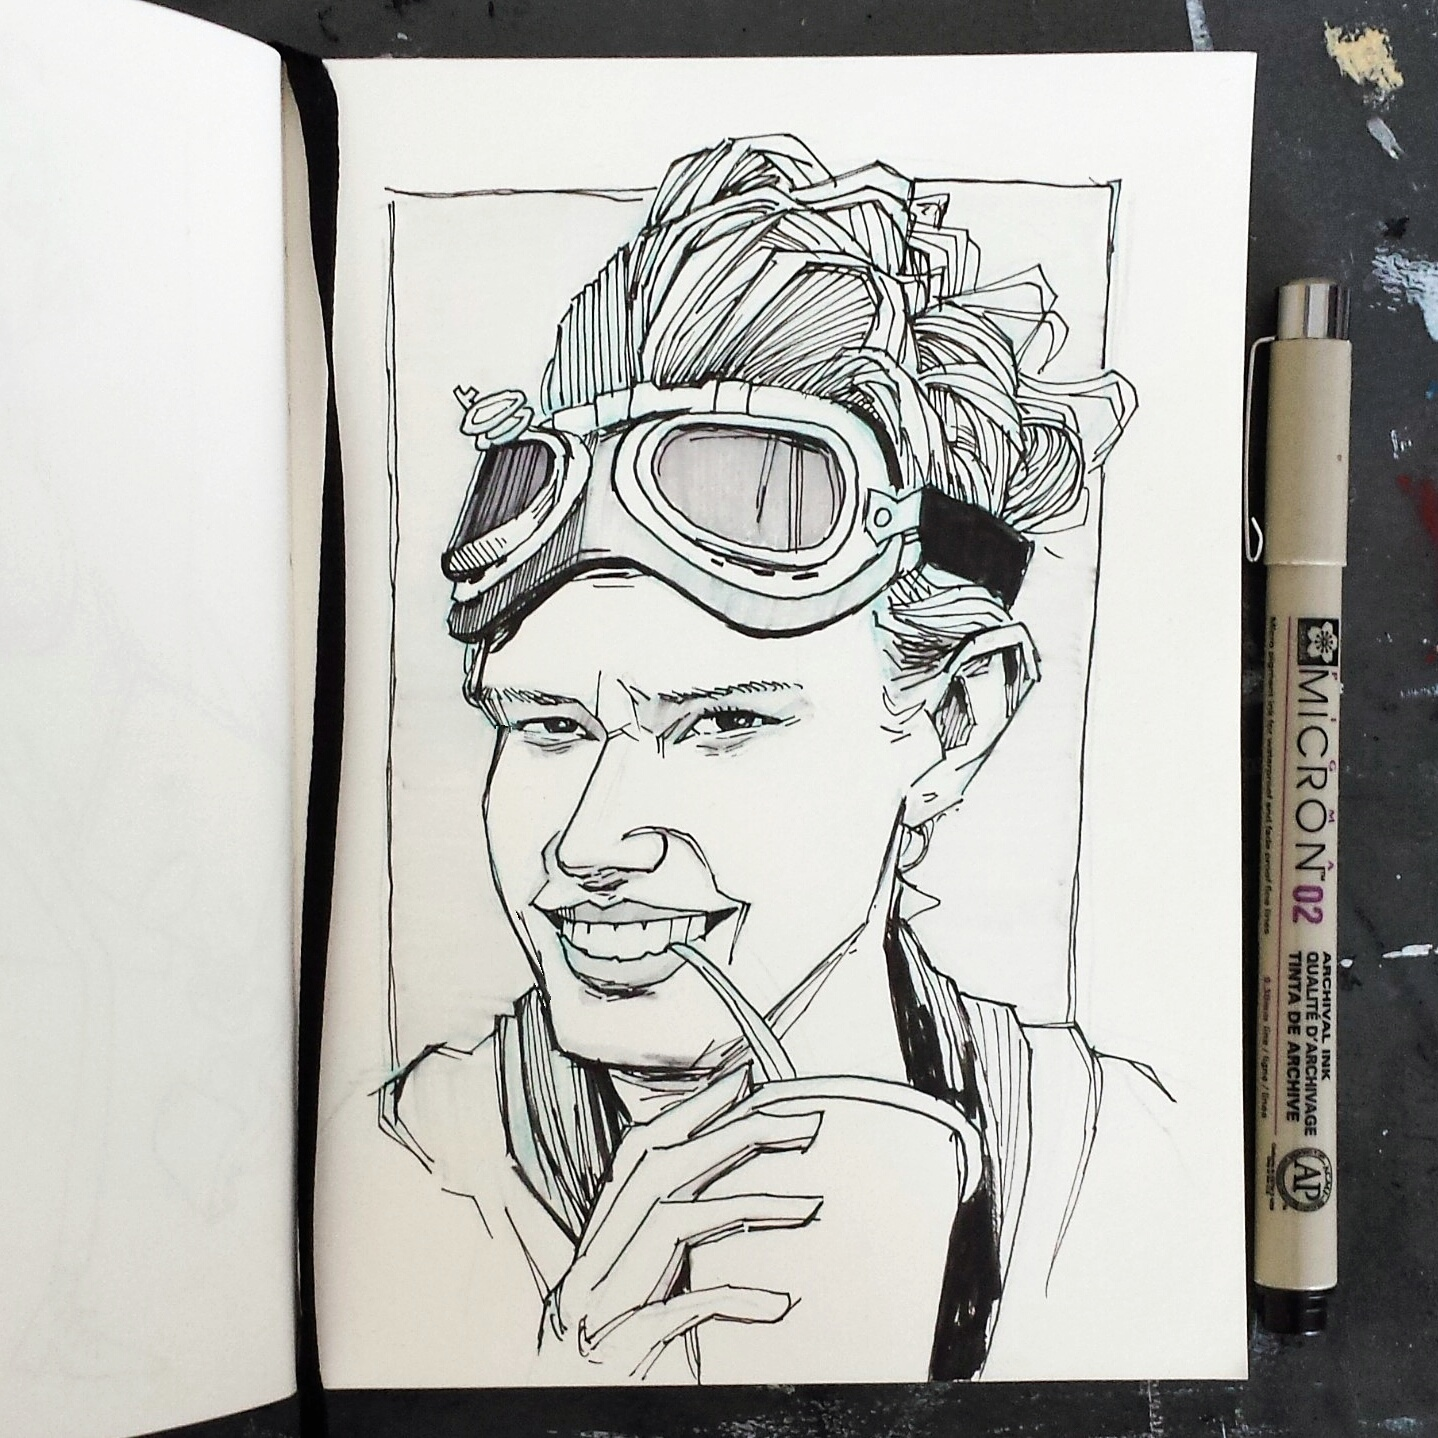 illustrated Hotlzmann sketchbook drawing